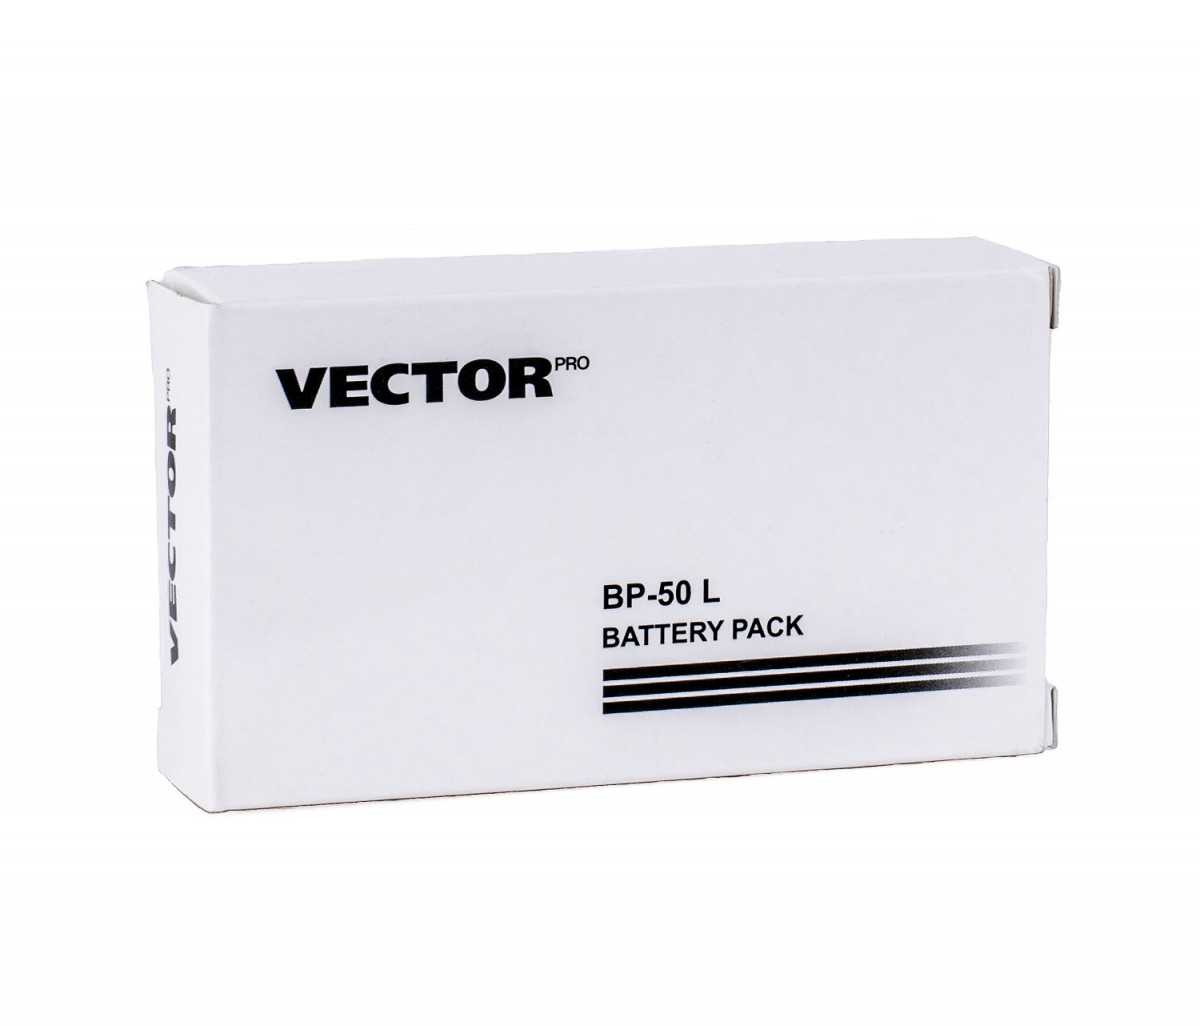 Штатный Li-Ion аккумулятор Vector BP-50 L